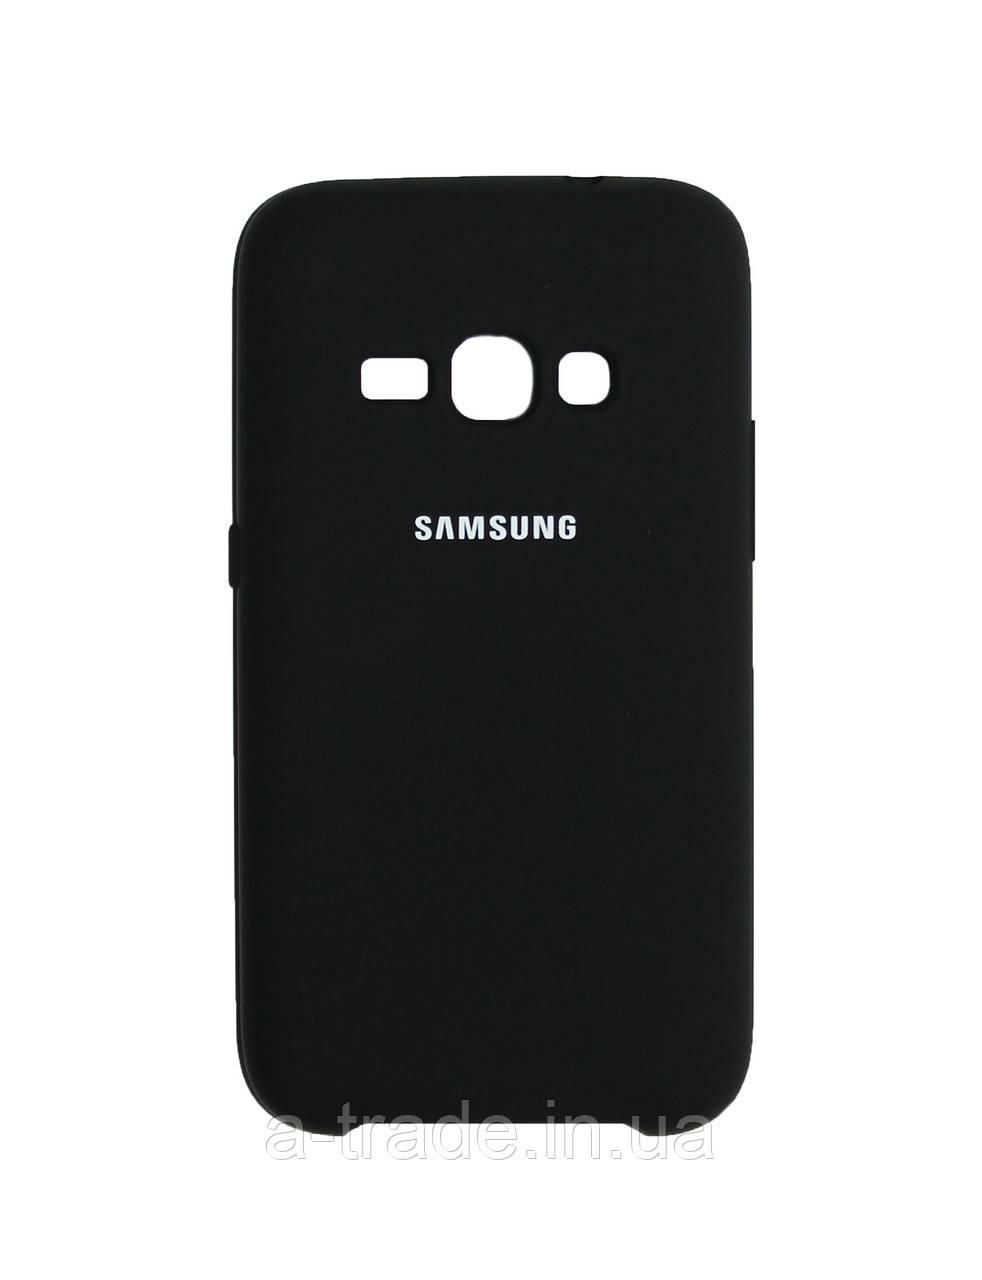 Harga Dan Spesifikasi Samsung J120 Termurah 2018 Wiper Nwb Toyota Innova 24ampquot Ampamp 16ampquot Standard Soft Touch Galaxy J1 2016